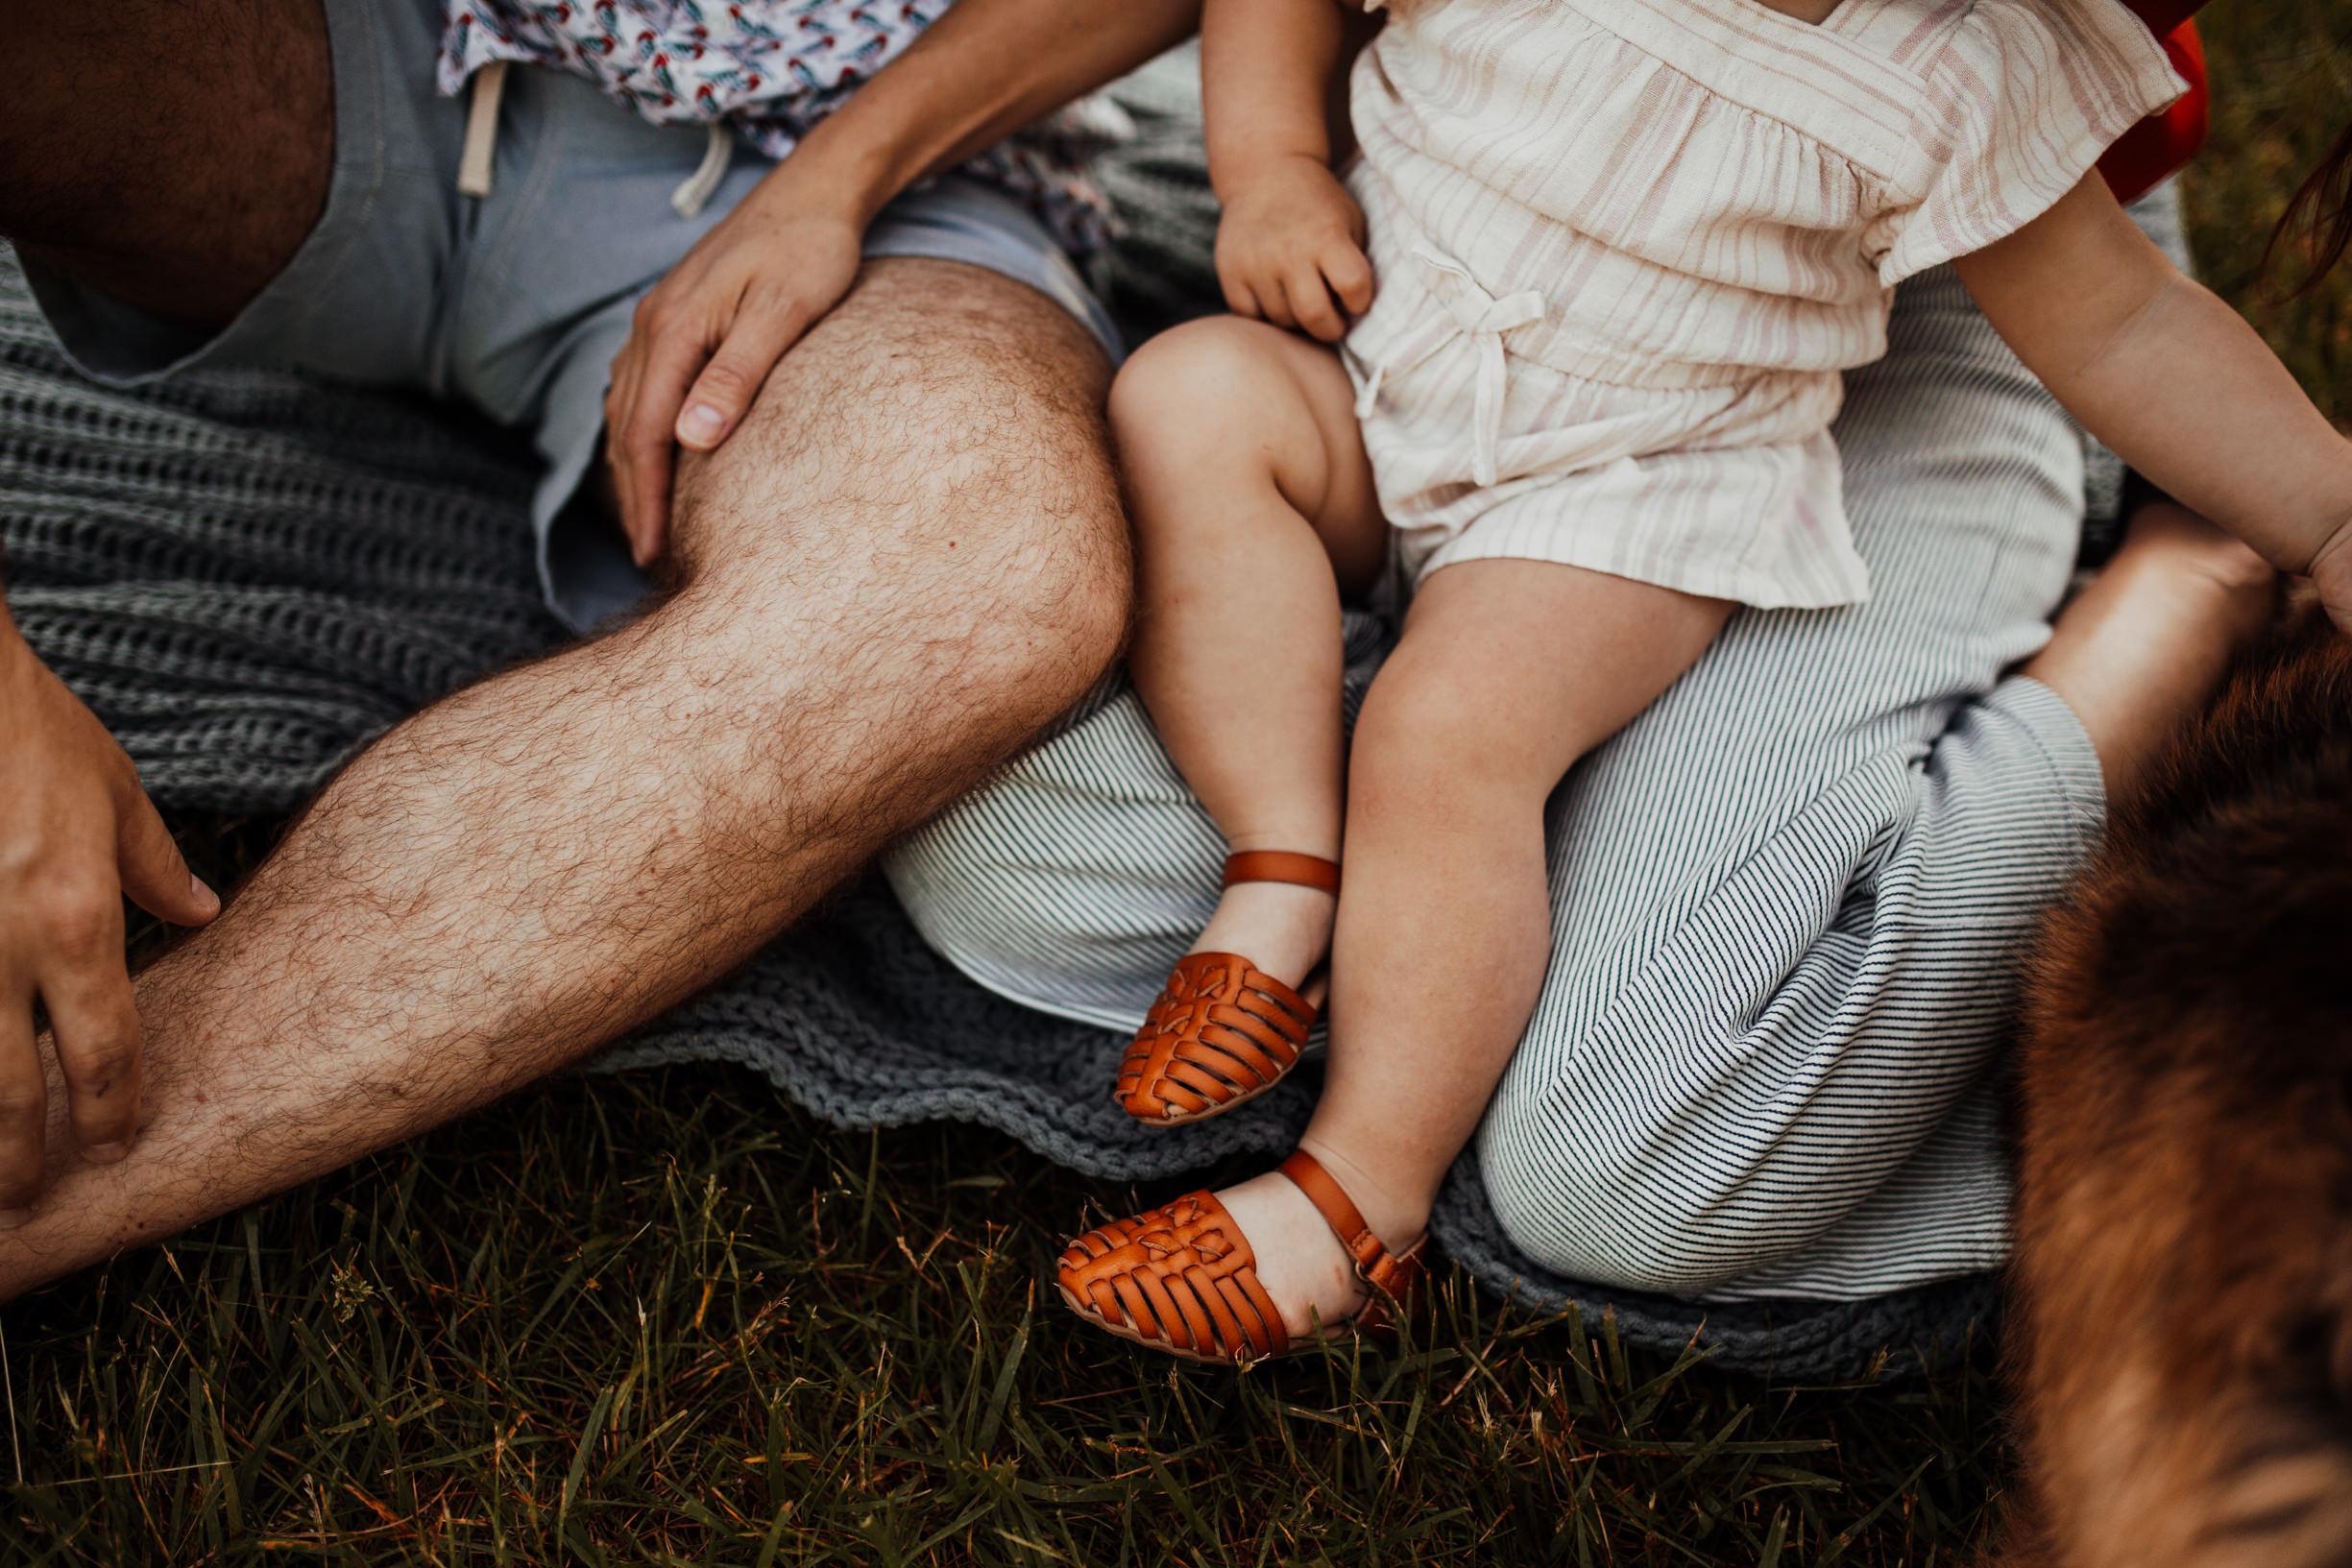 louisville-family-photographer-kentucky-crystal-ludwick-photo (3 of 45).jpg